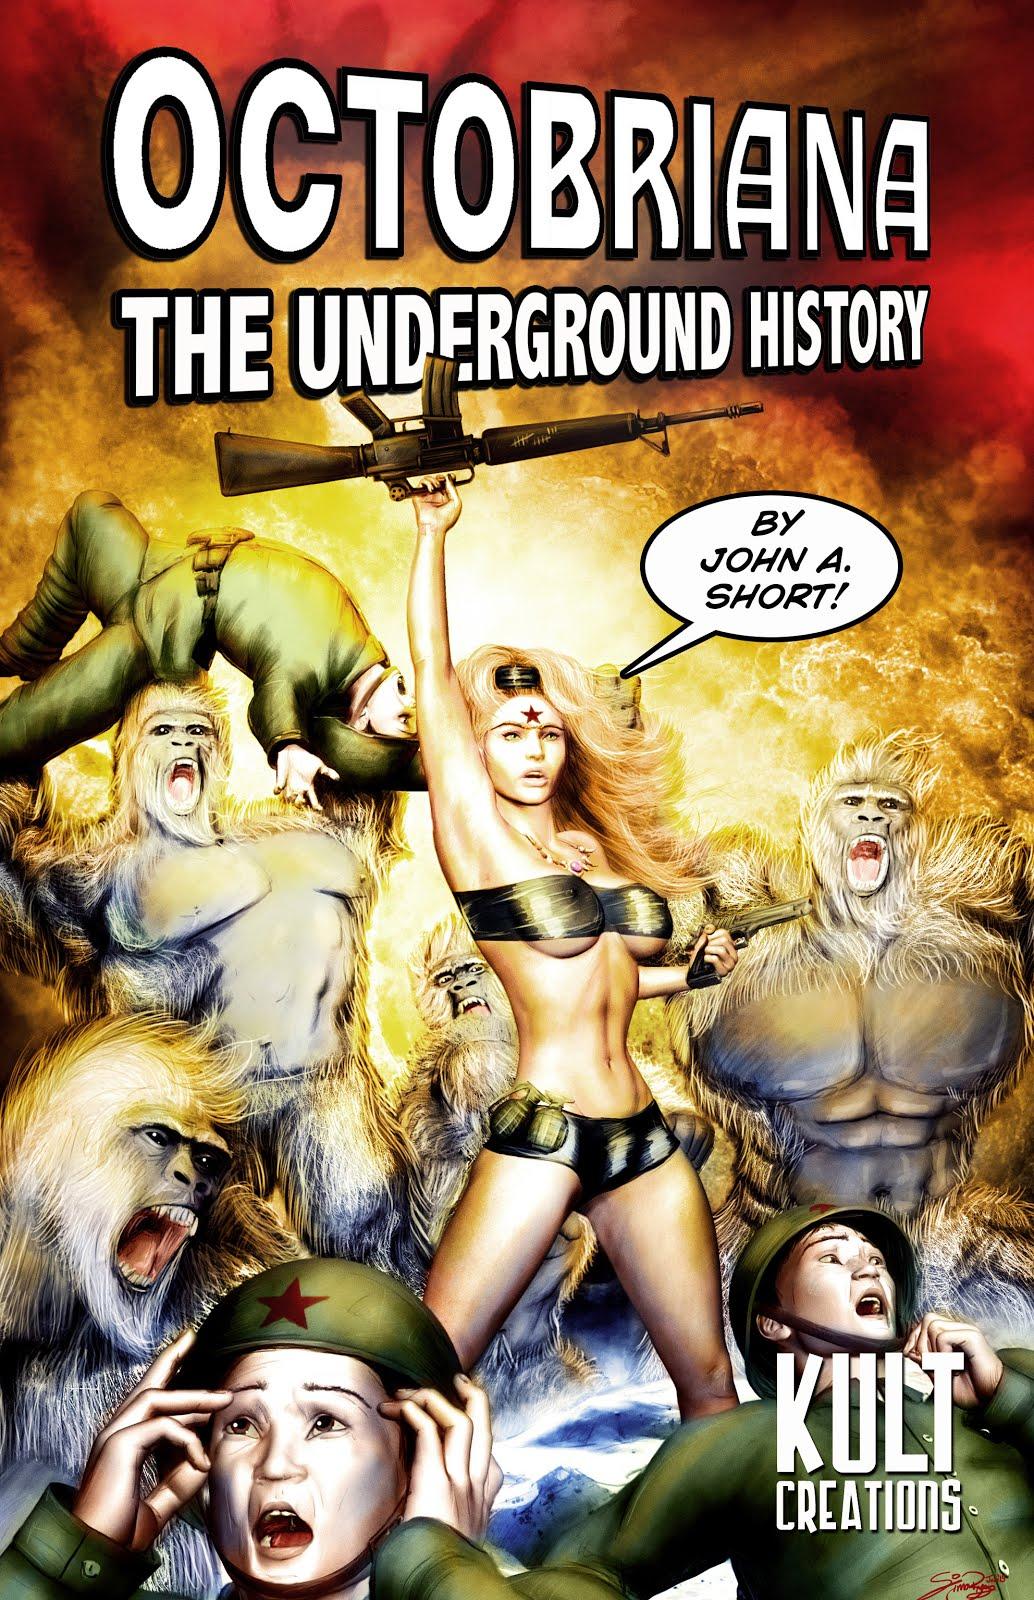 Buy OCTOBRIANA THE UNDERGROUND HISTORY below!